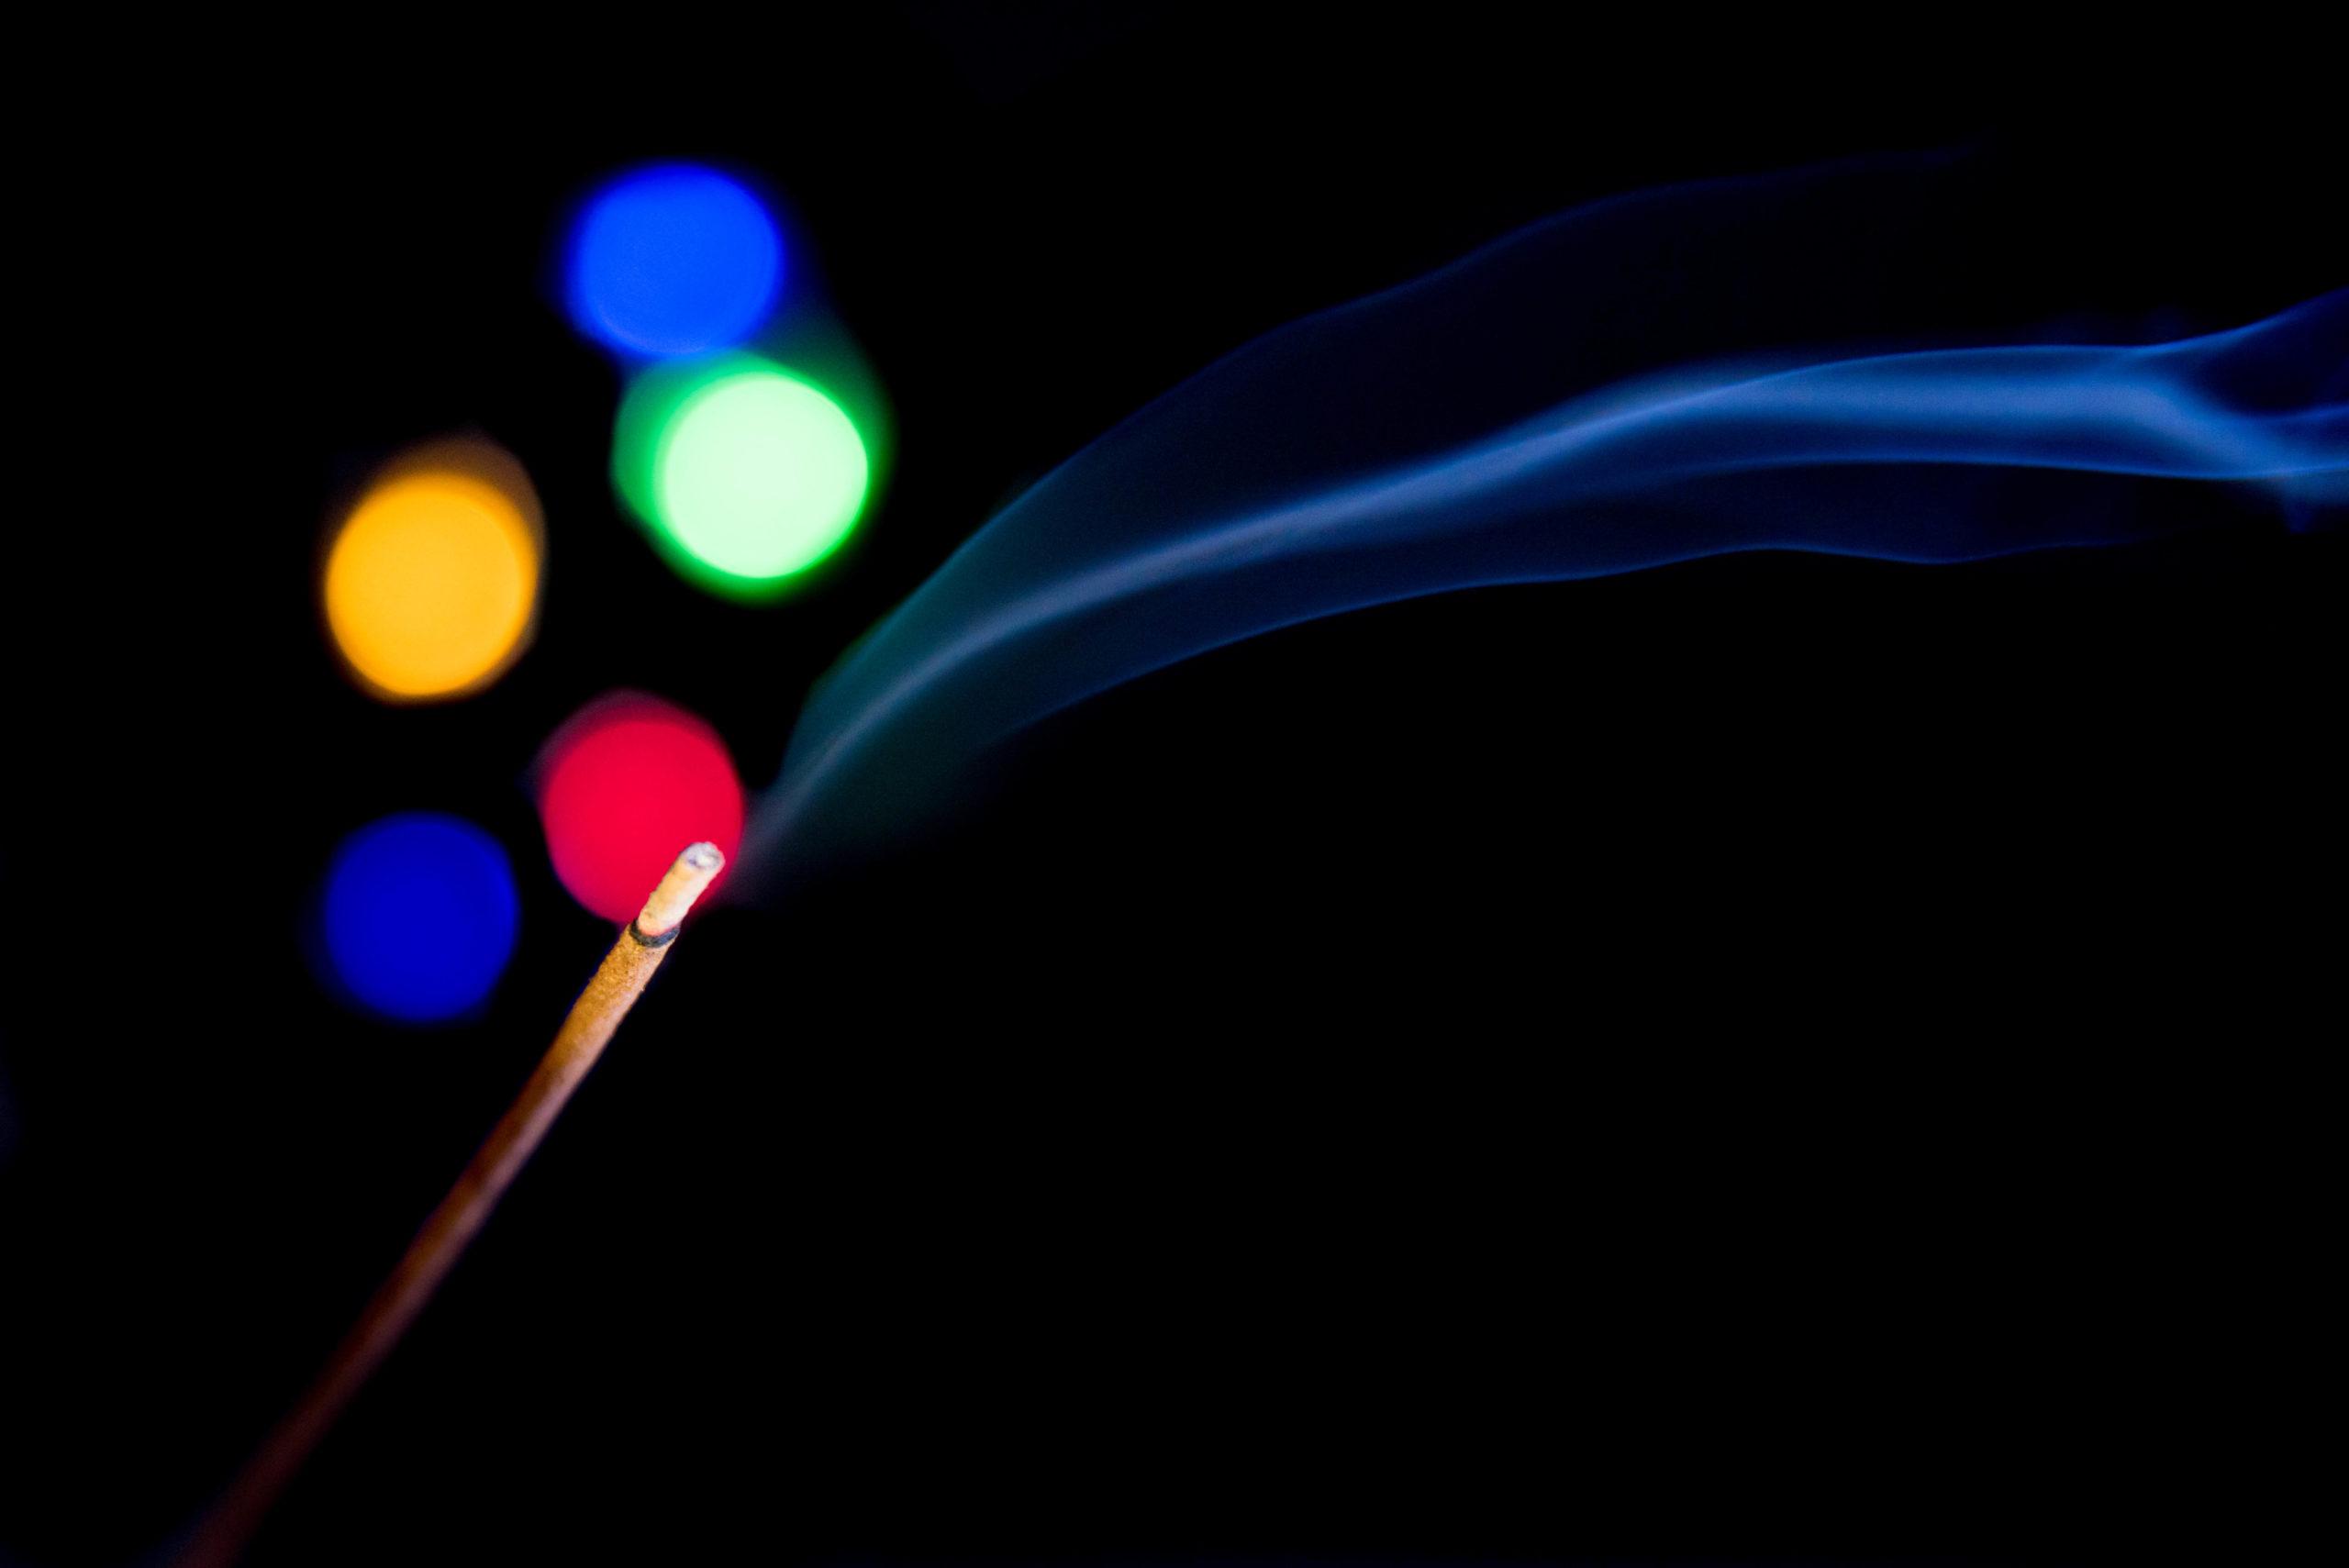 Packshot fumée